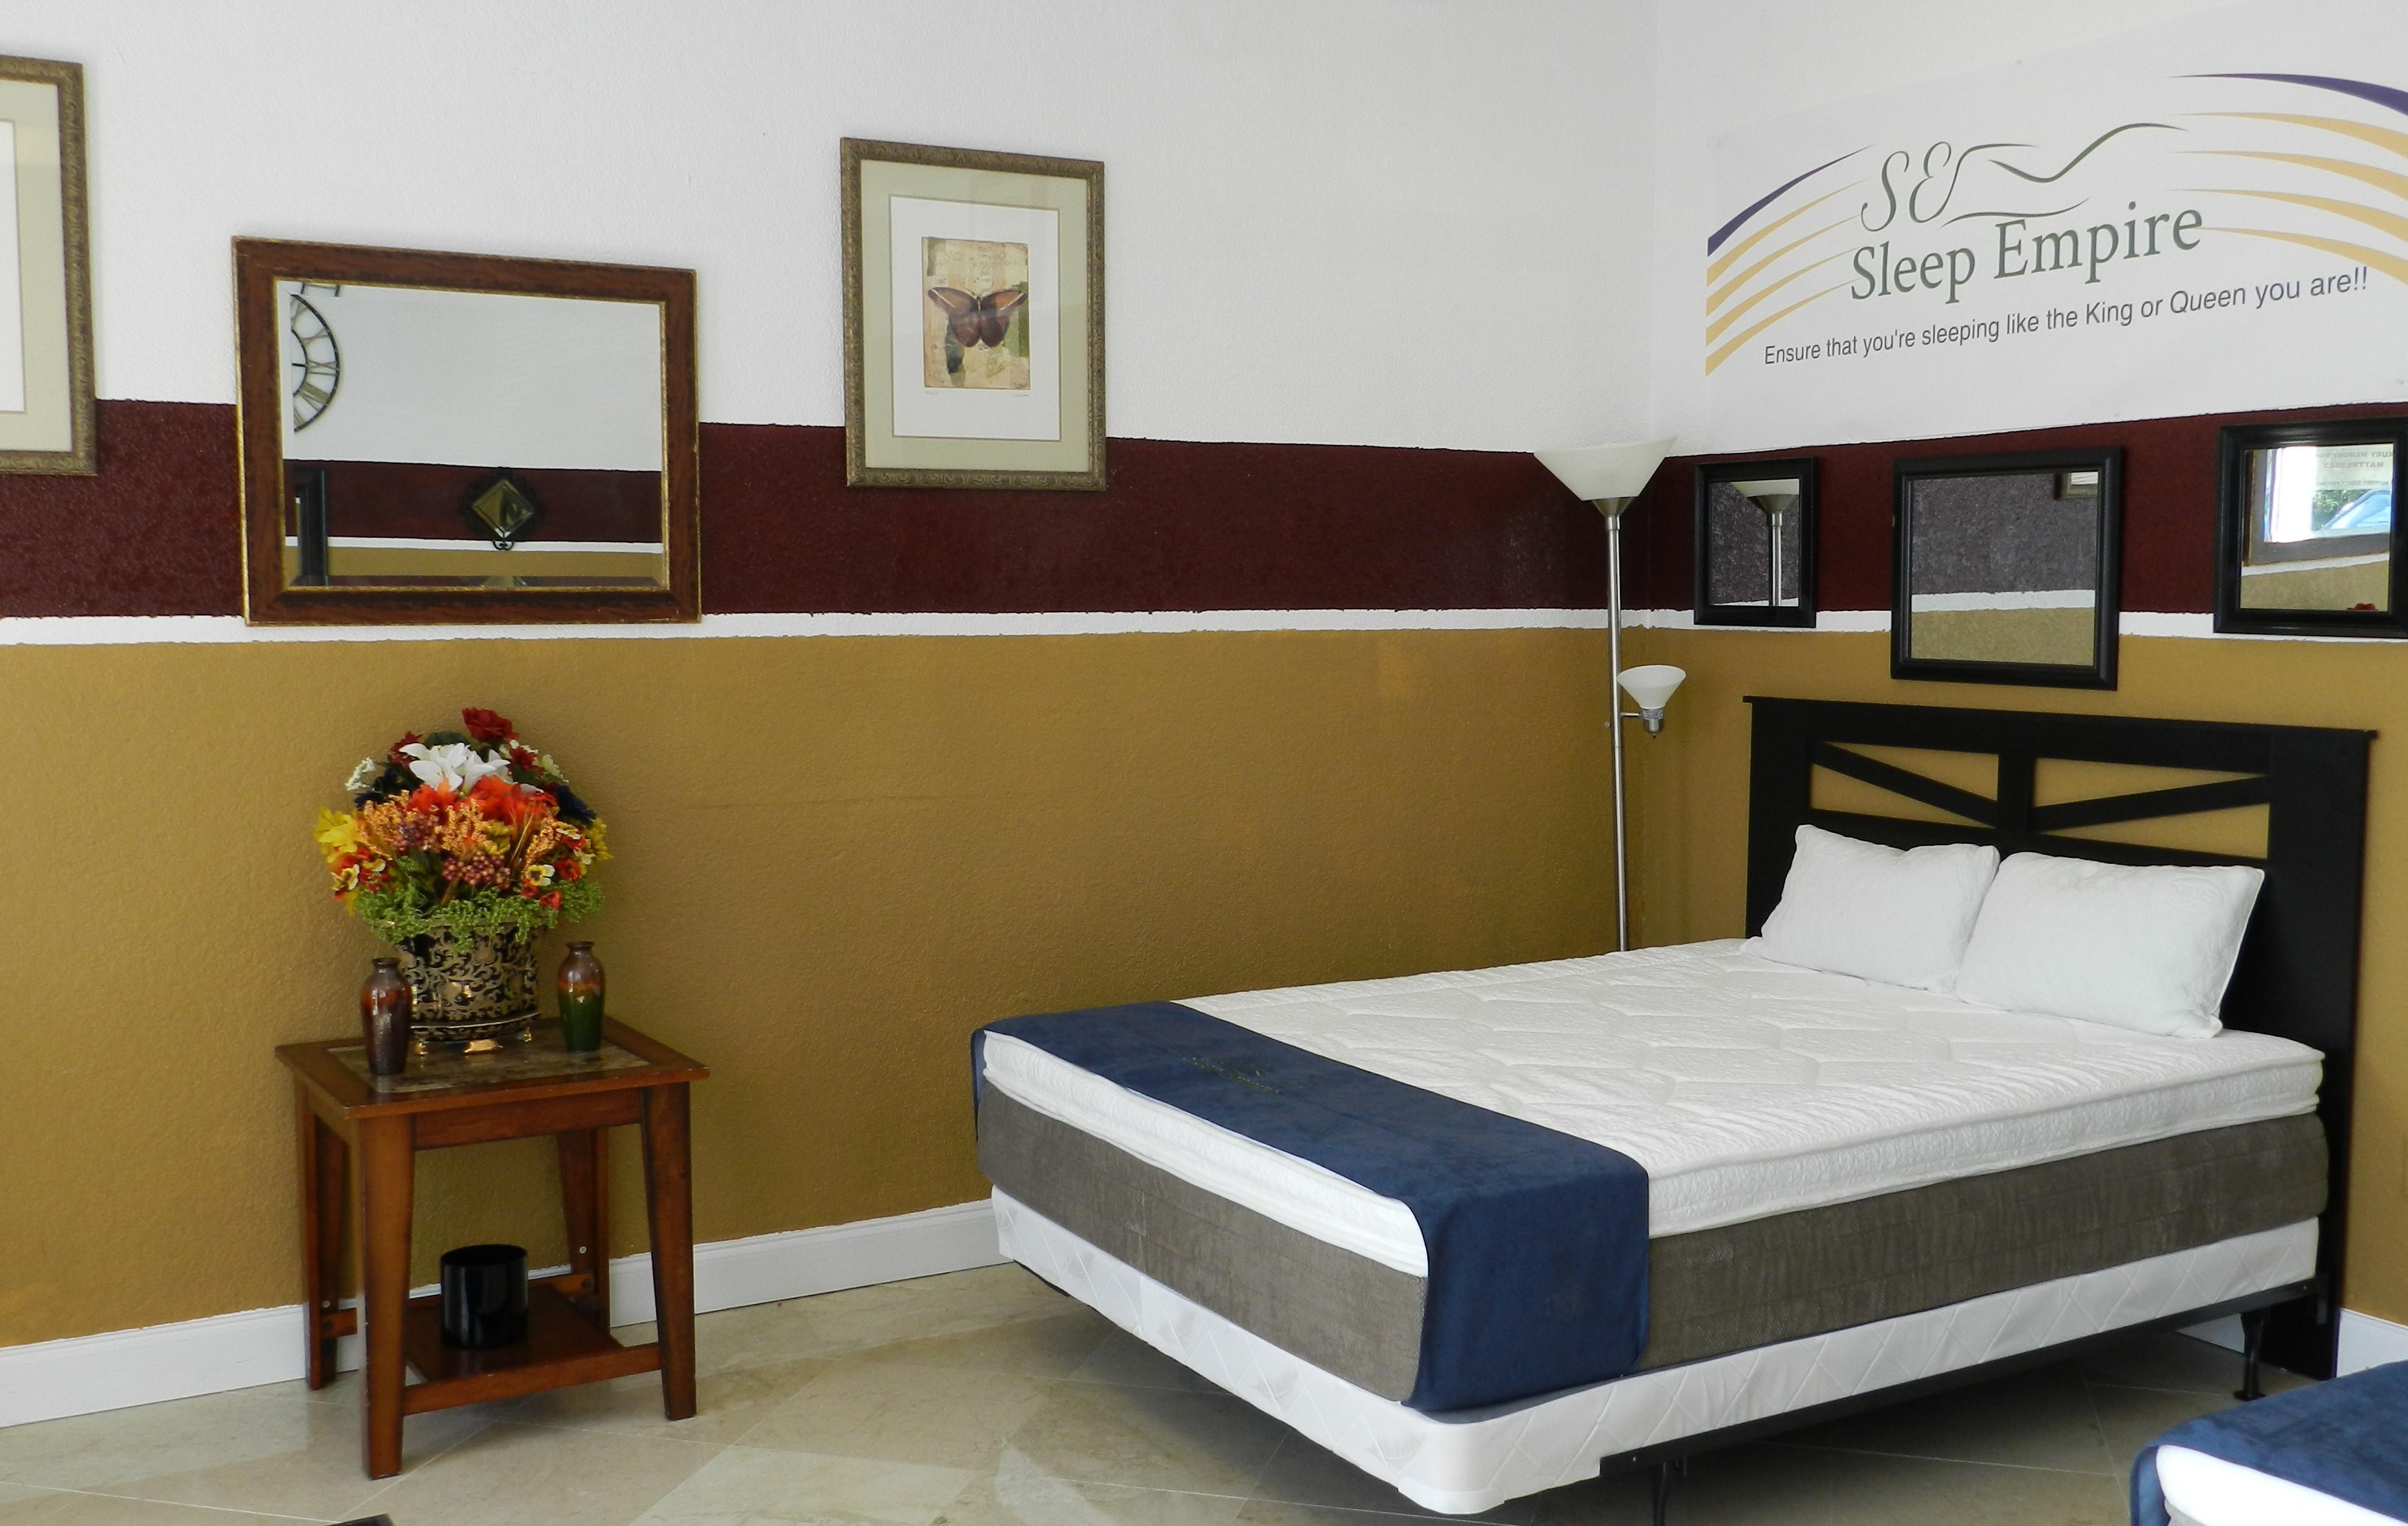 Beau SLEEP EMPIRE LLC 1751 W Copans Rd Ste 7, Pompano Beach, FL 33064   YP.com